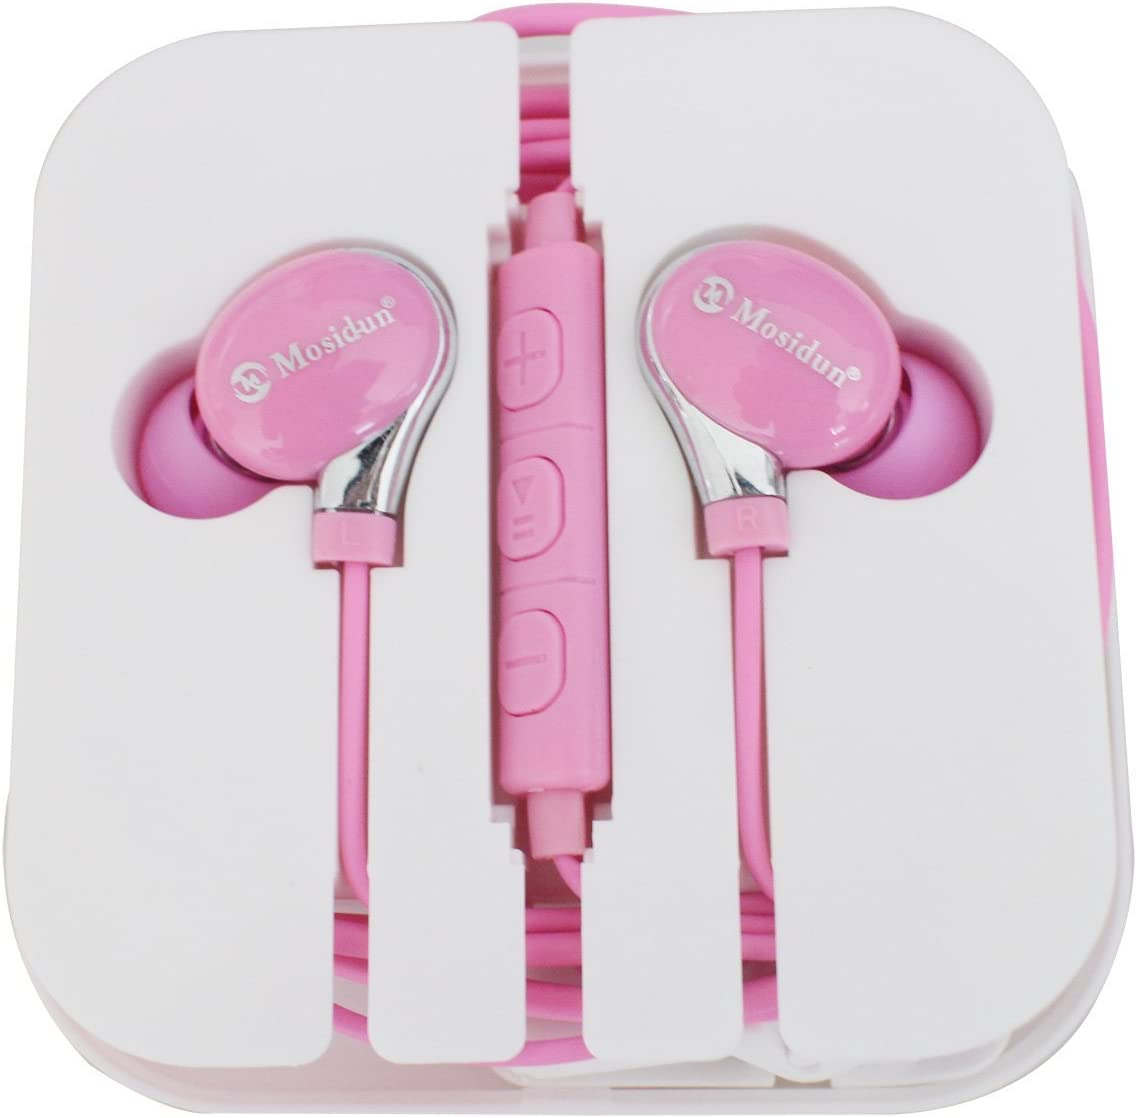 3.5mm Audio/Music Ear Plugs,Metal-Ear Earphones,Earbuds for iPhone 6s,iPhone 6plus,Samsung s7,Galaxy S6 Edge